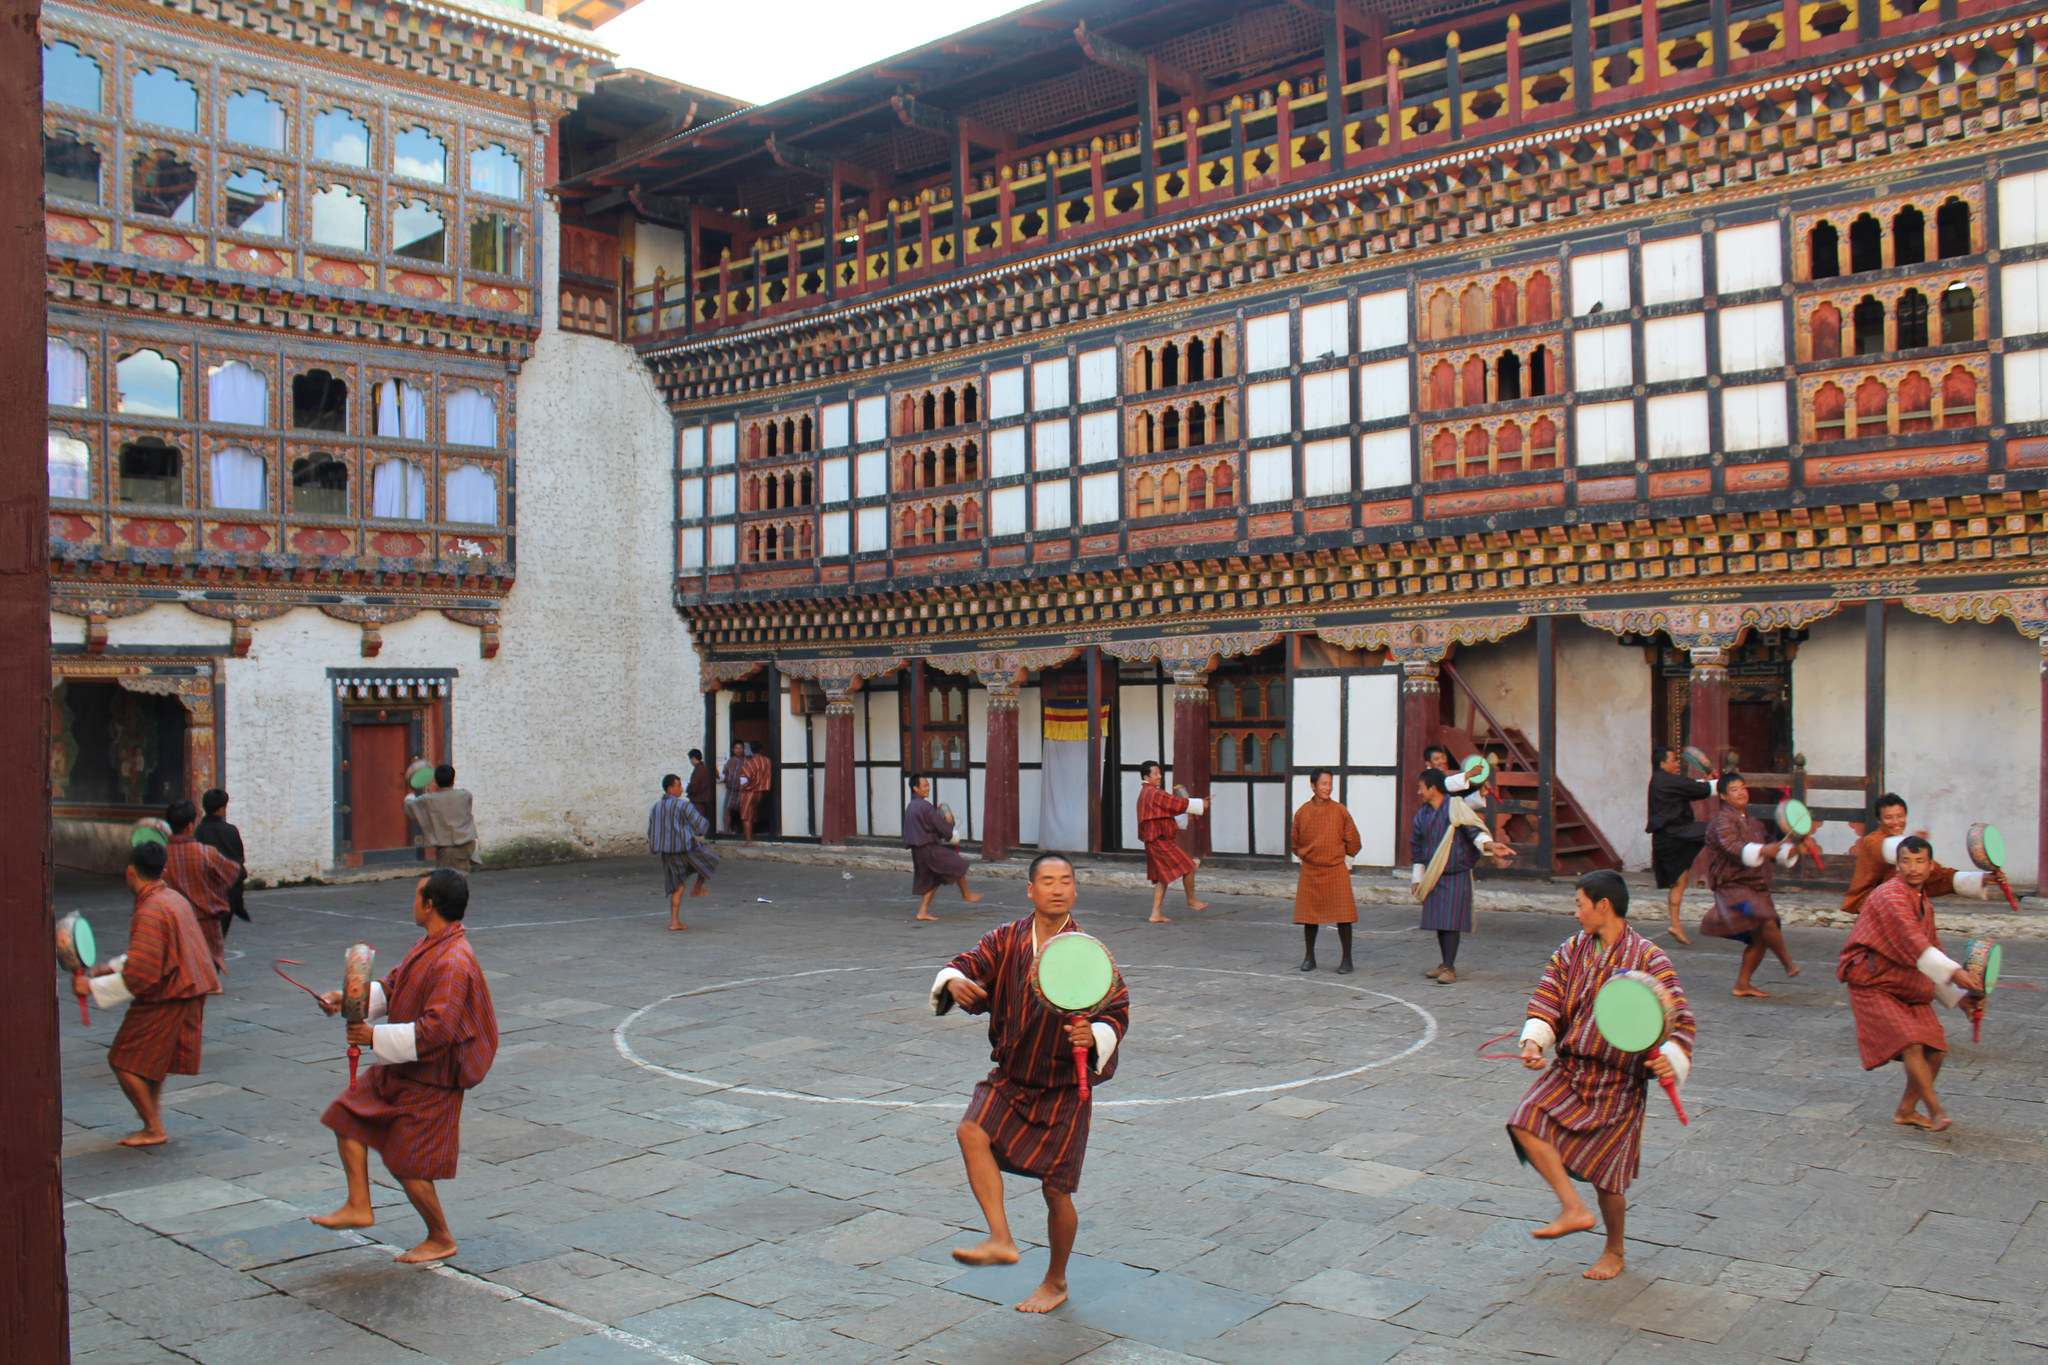 bhutan15 Bhutan   The Land of the Thunder Dragon